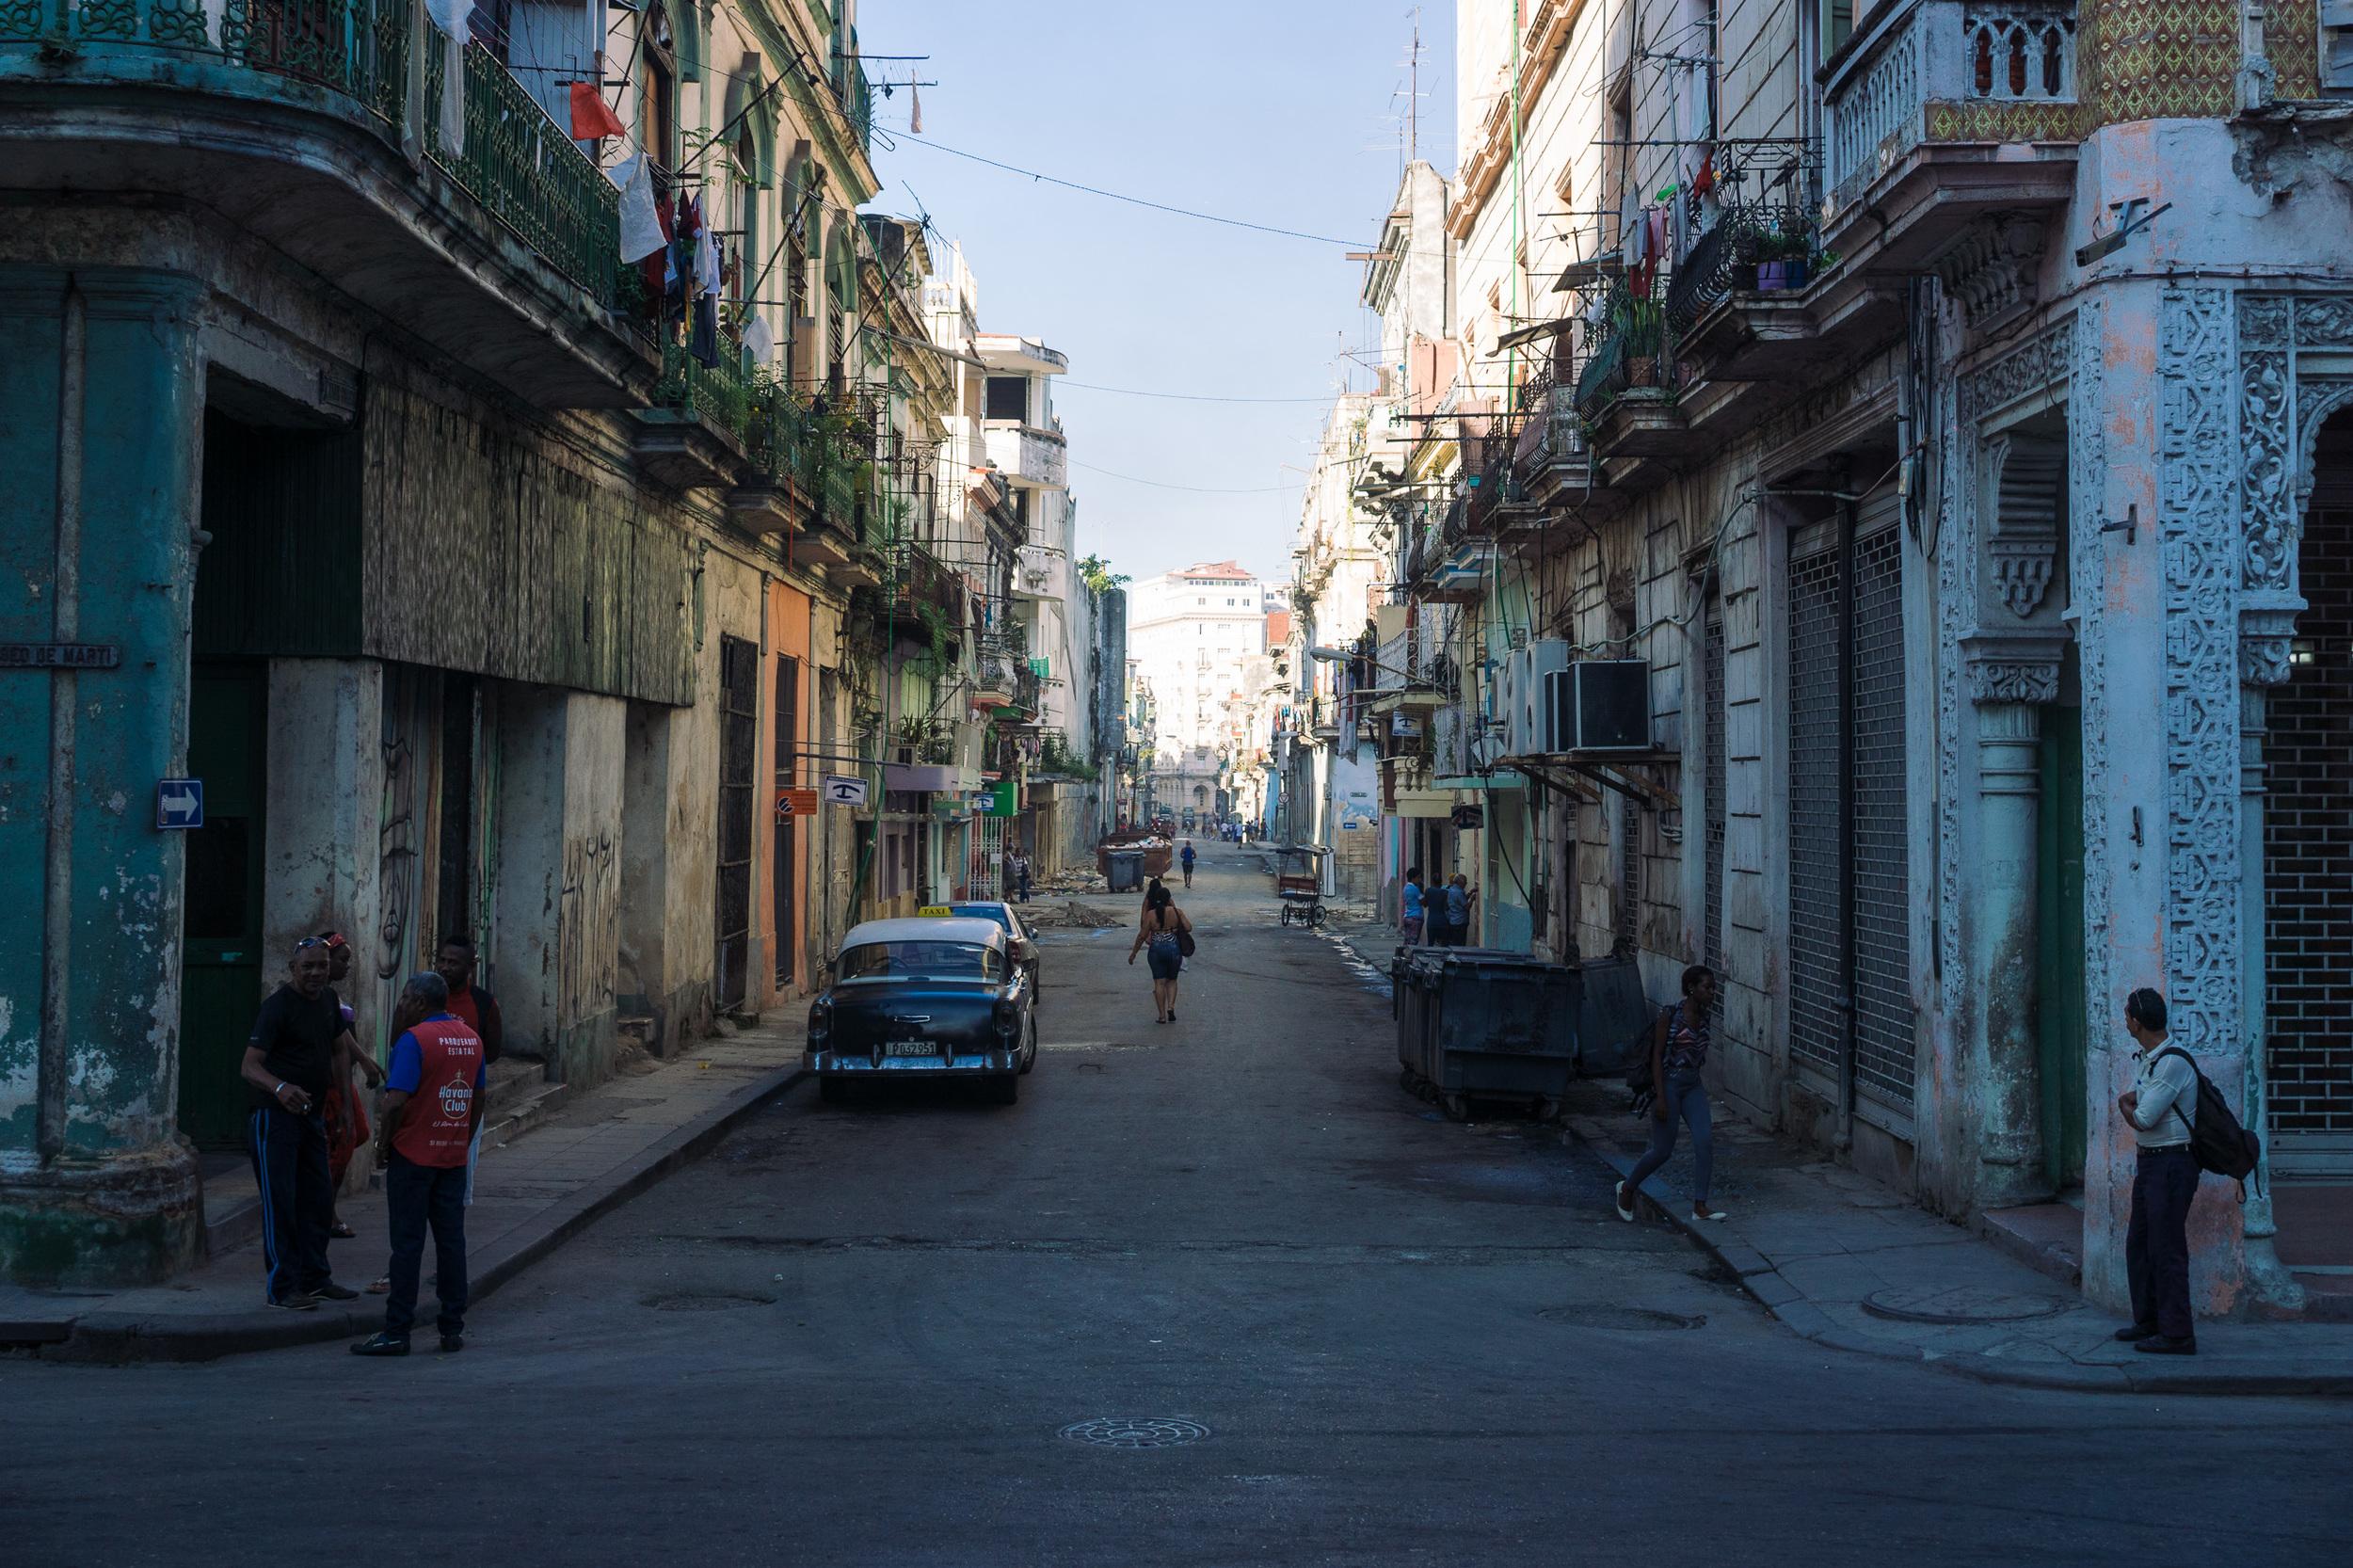 DeClaro-Photography-Cuba-02798.jpg